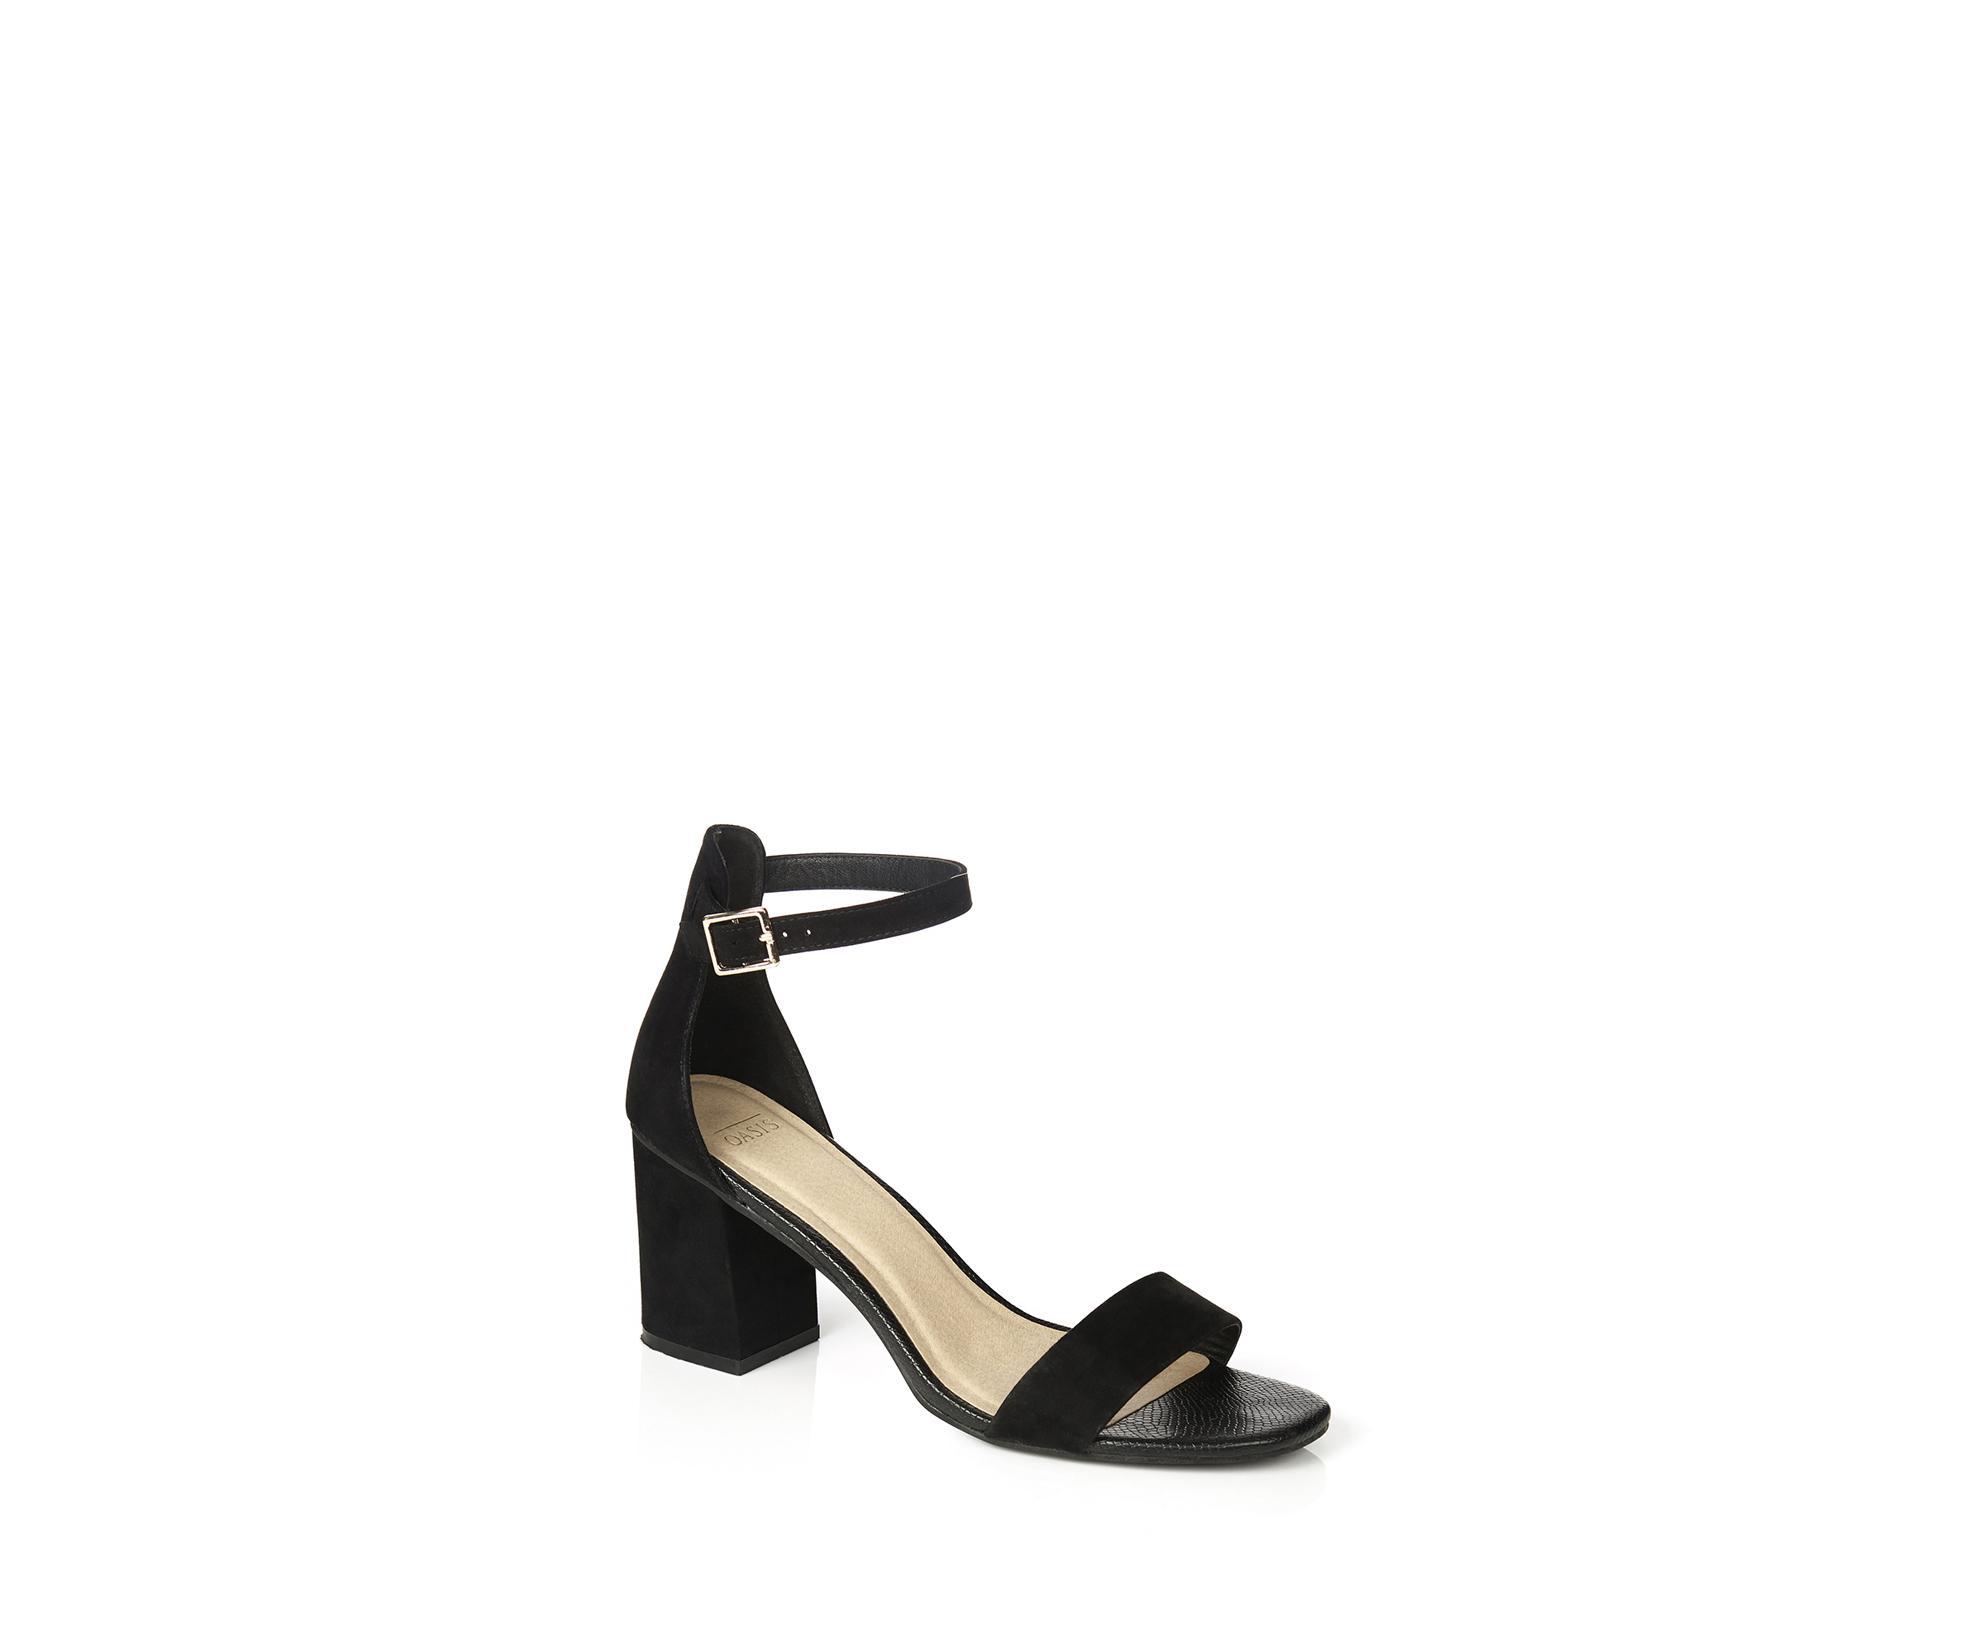 b608d0bad5d Lyst - Oasis Rhea Block Heel in Black